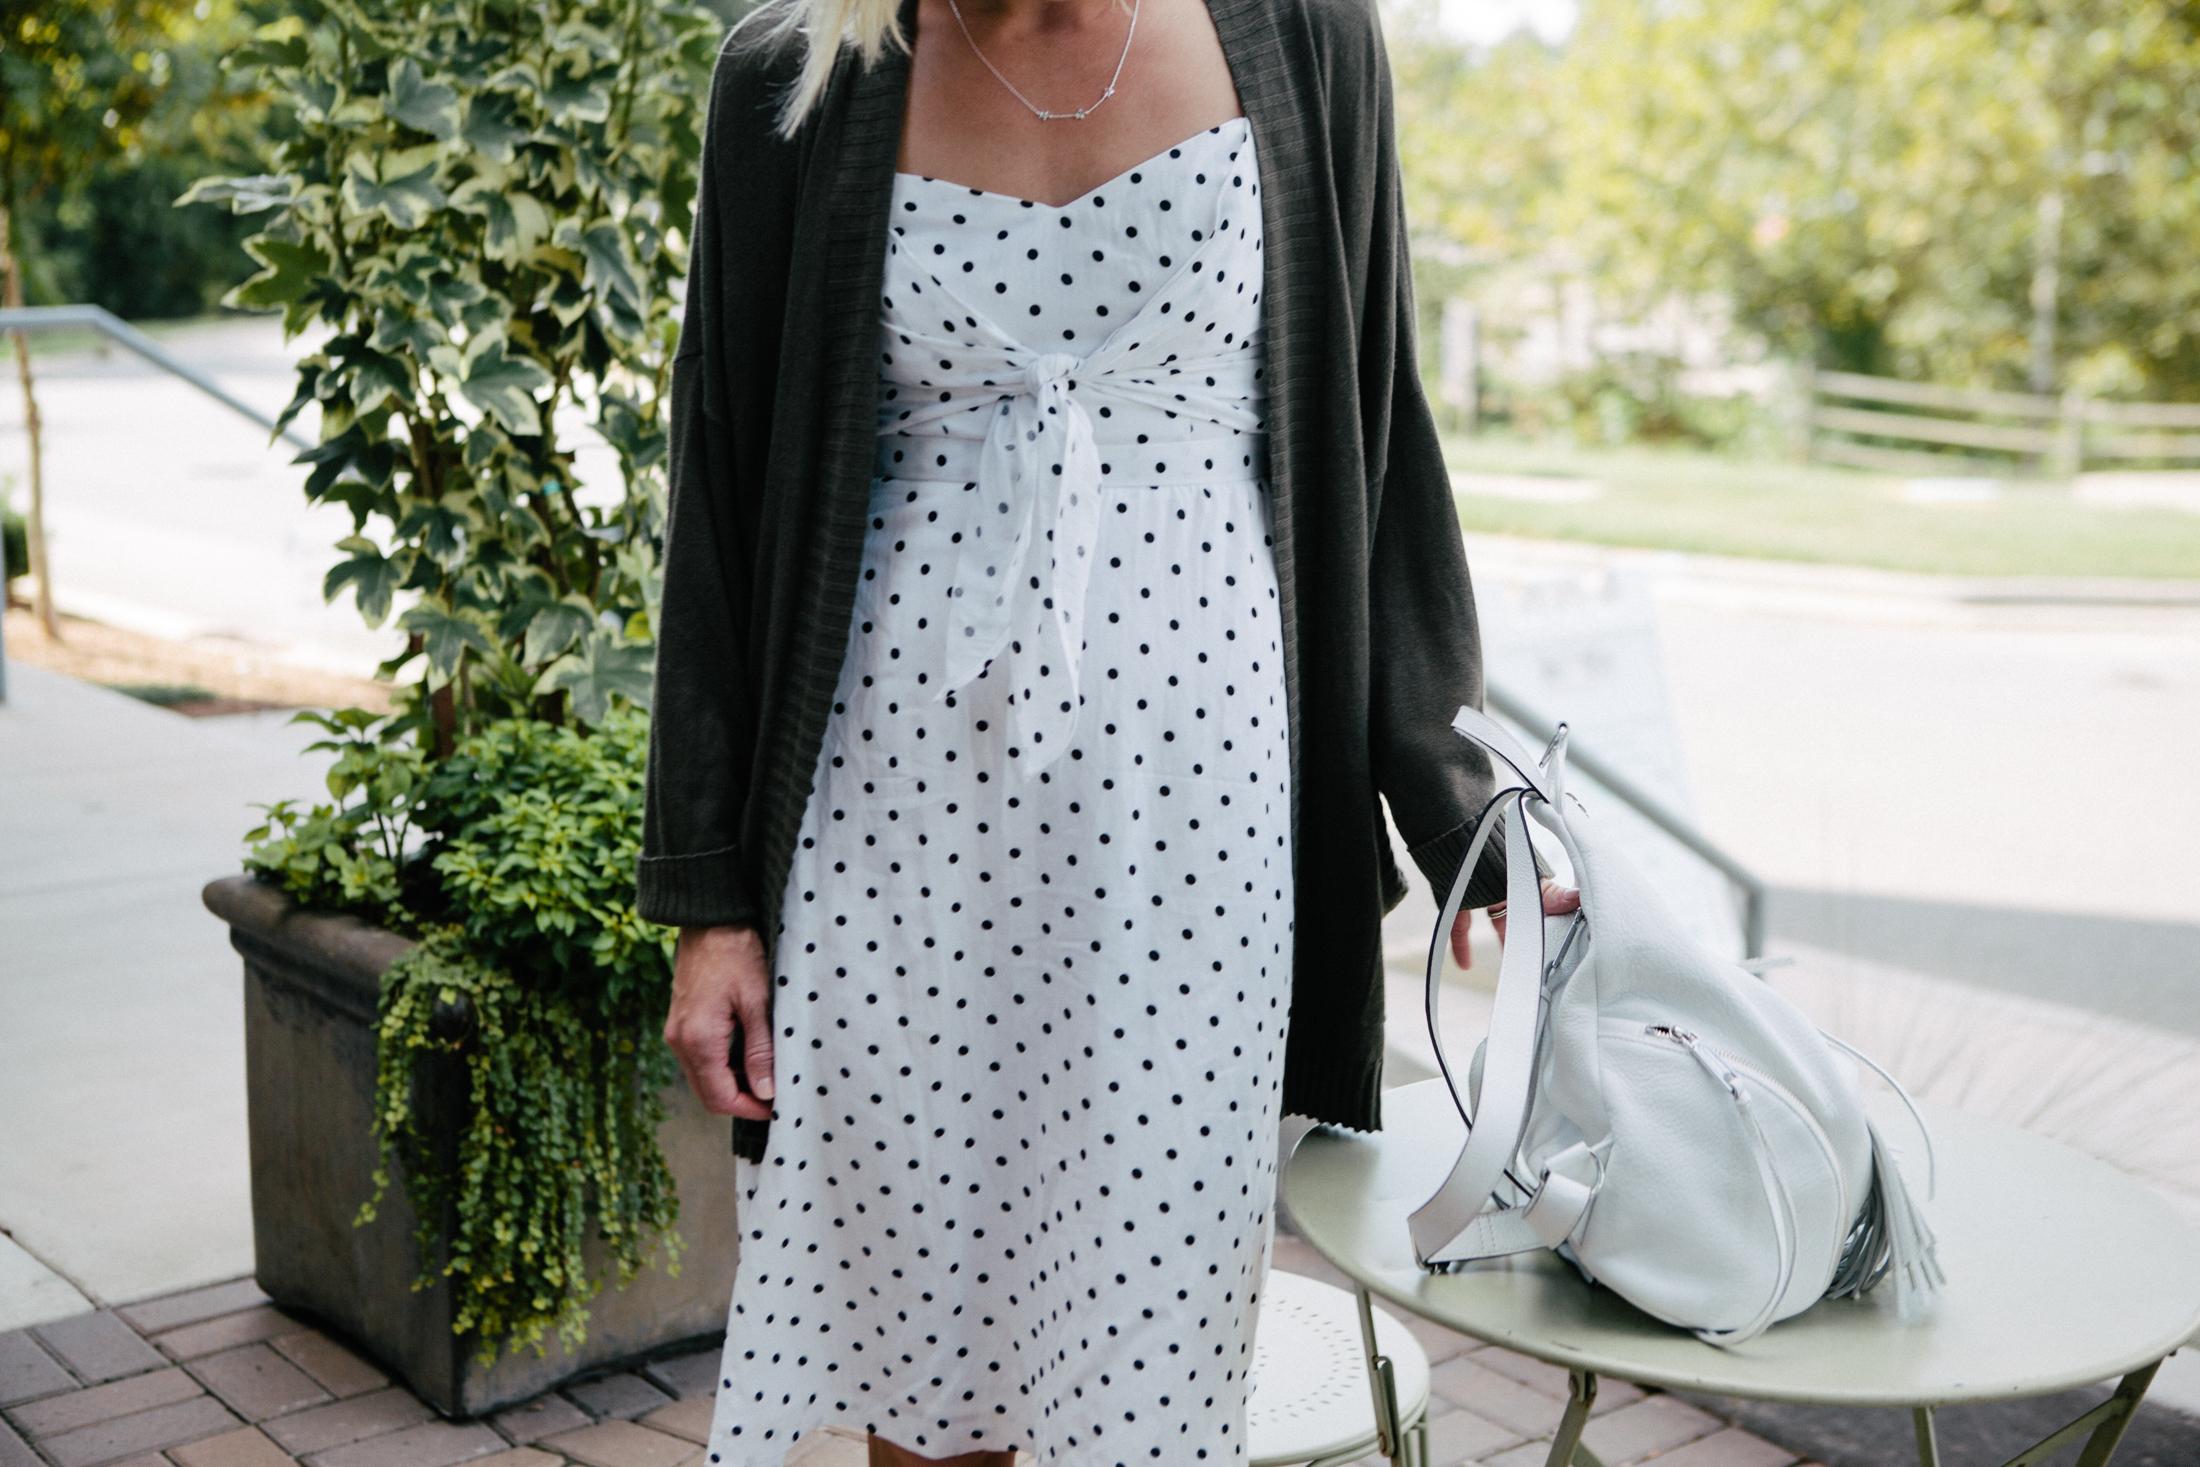 polka dot dress and cardigan